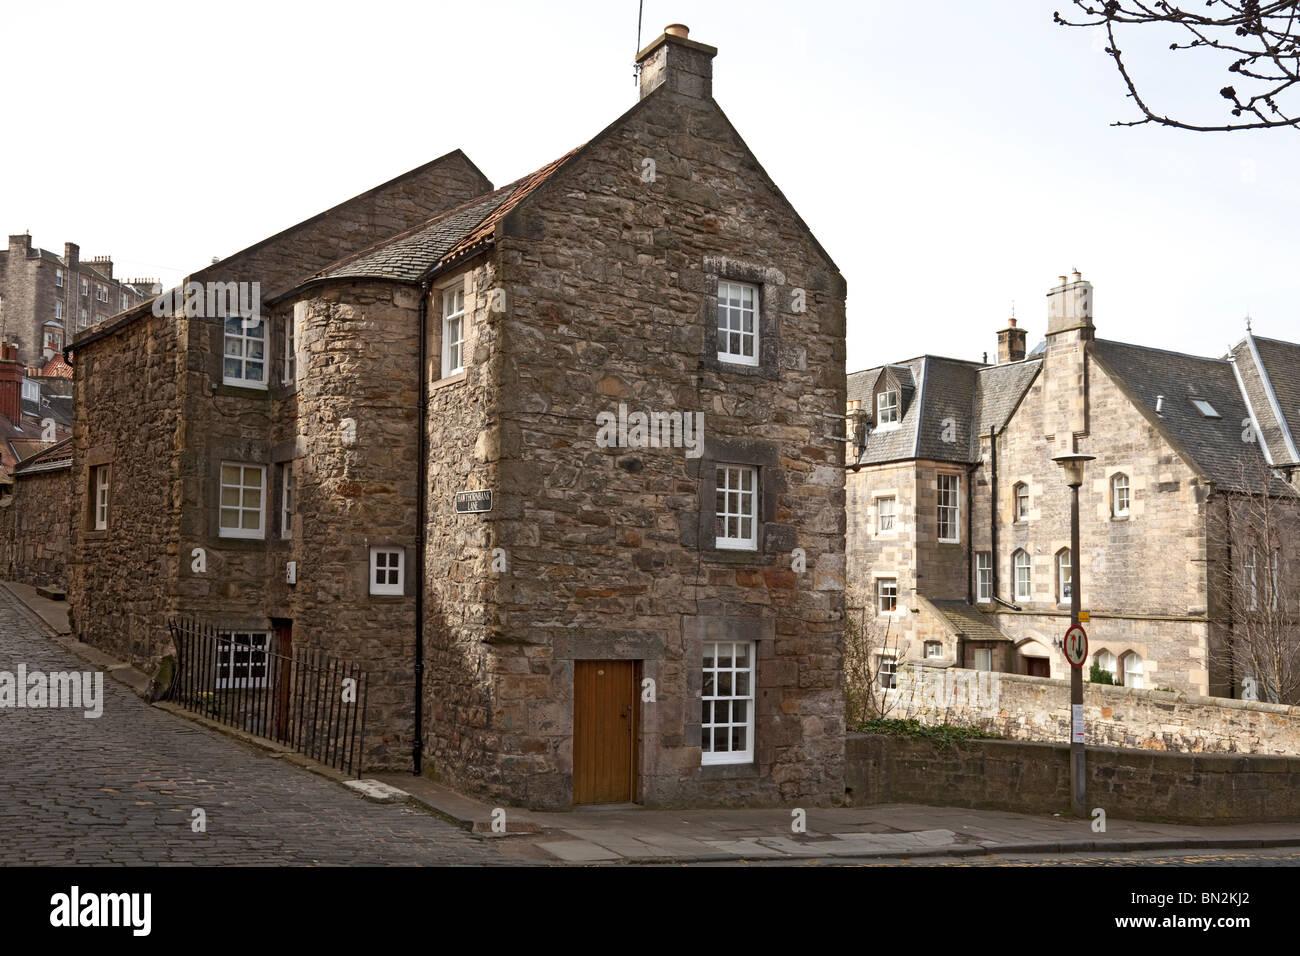 Old townhouses in Hawthornbank Lane, Dean Village, Edinburgh, Scotland, UK. - Stock Image